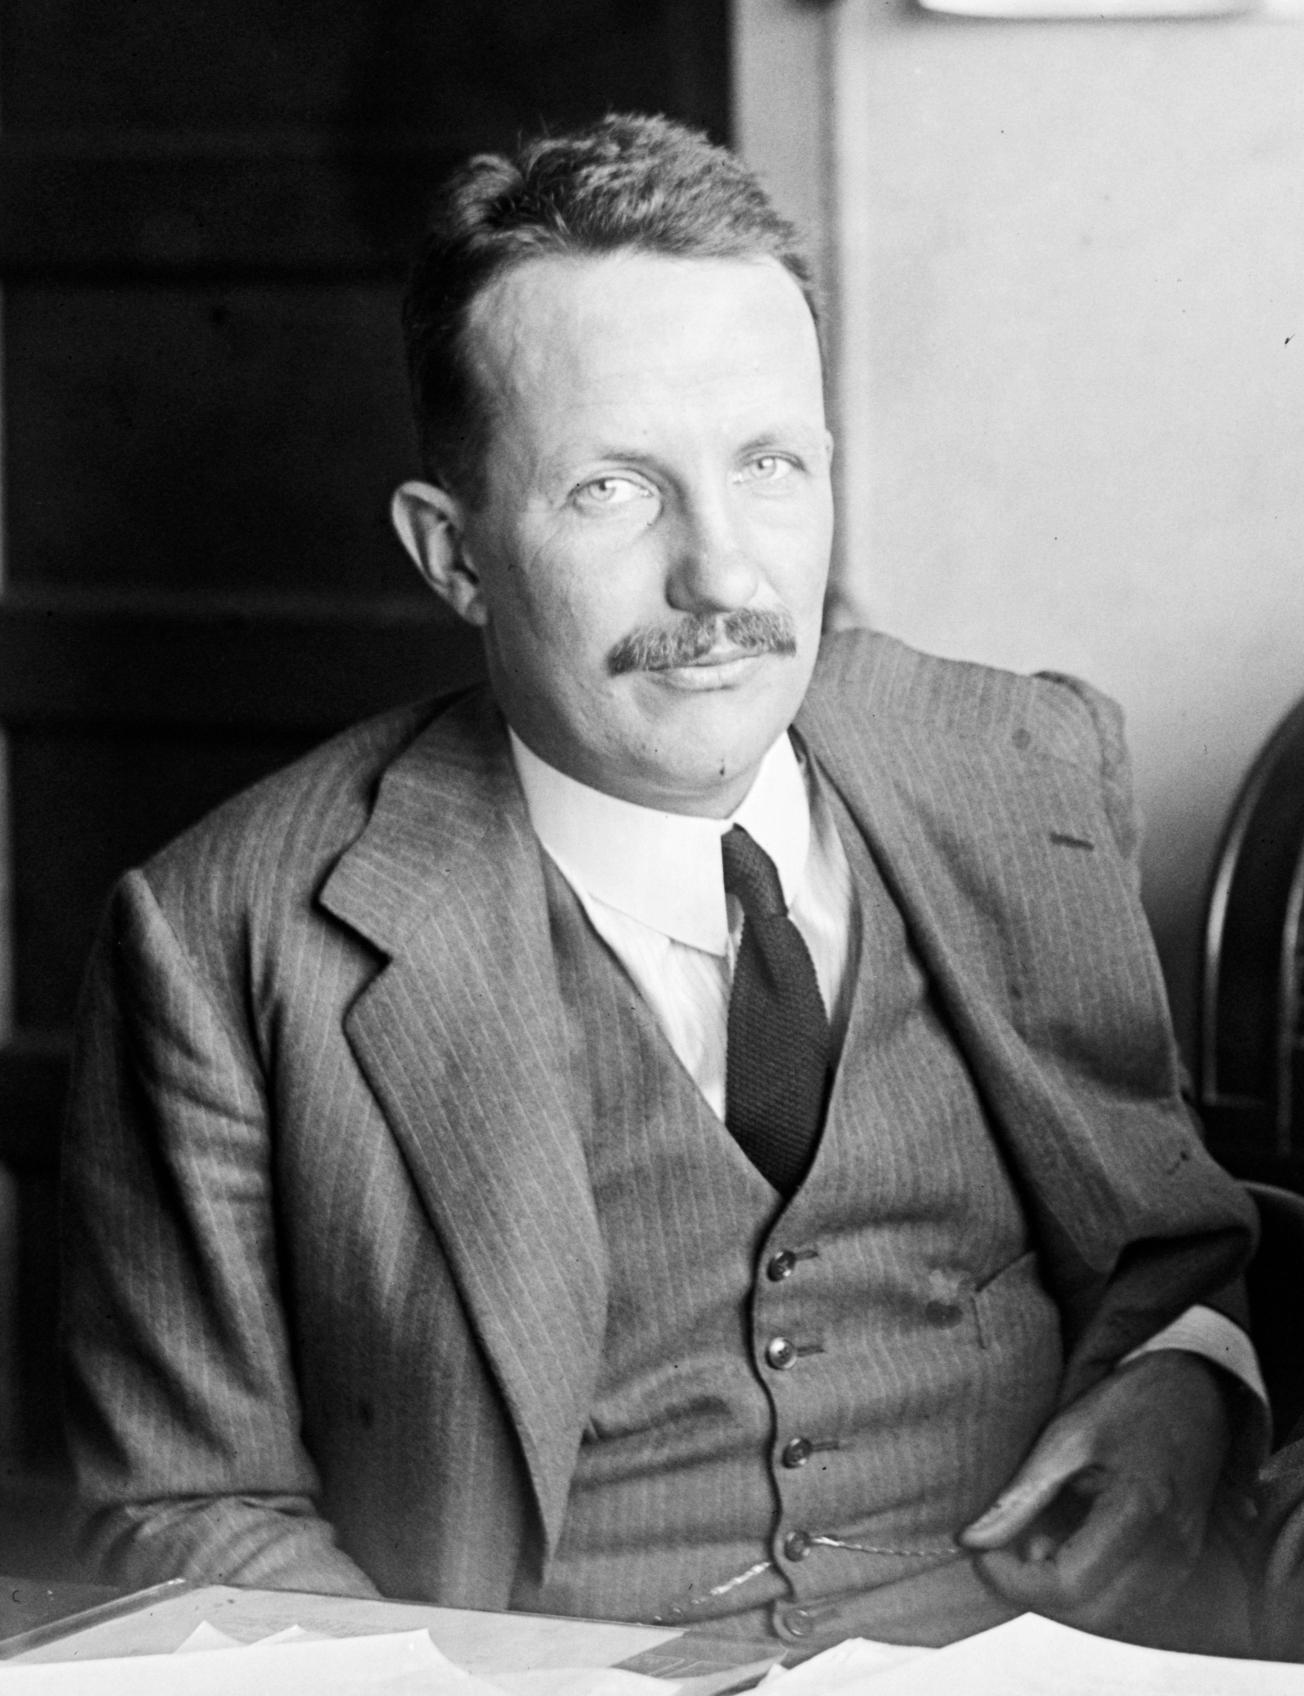 Image of Kermit Roosevelt from Wikidata